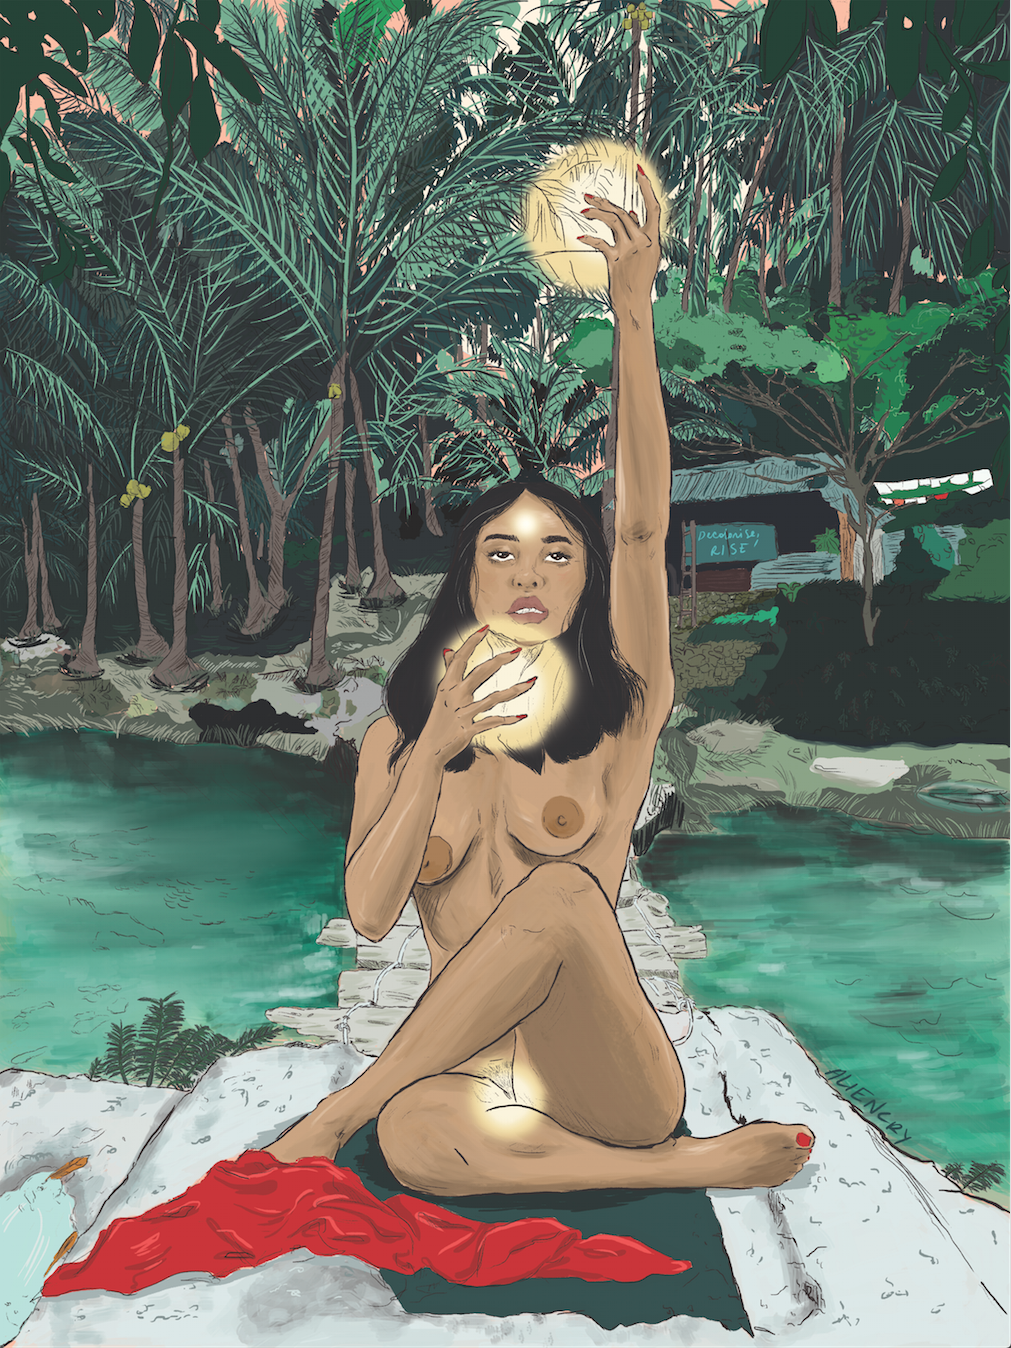 Island Woman Rise, Decolonise